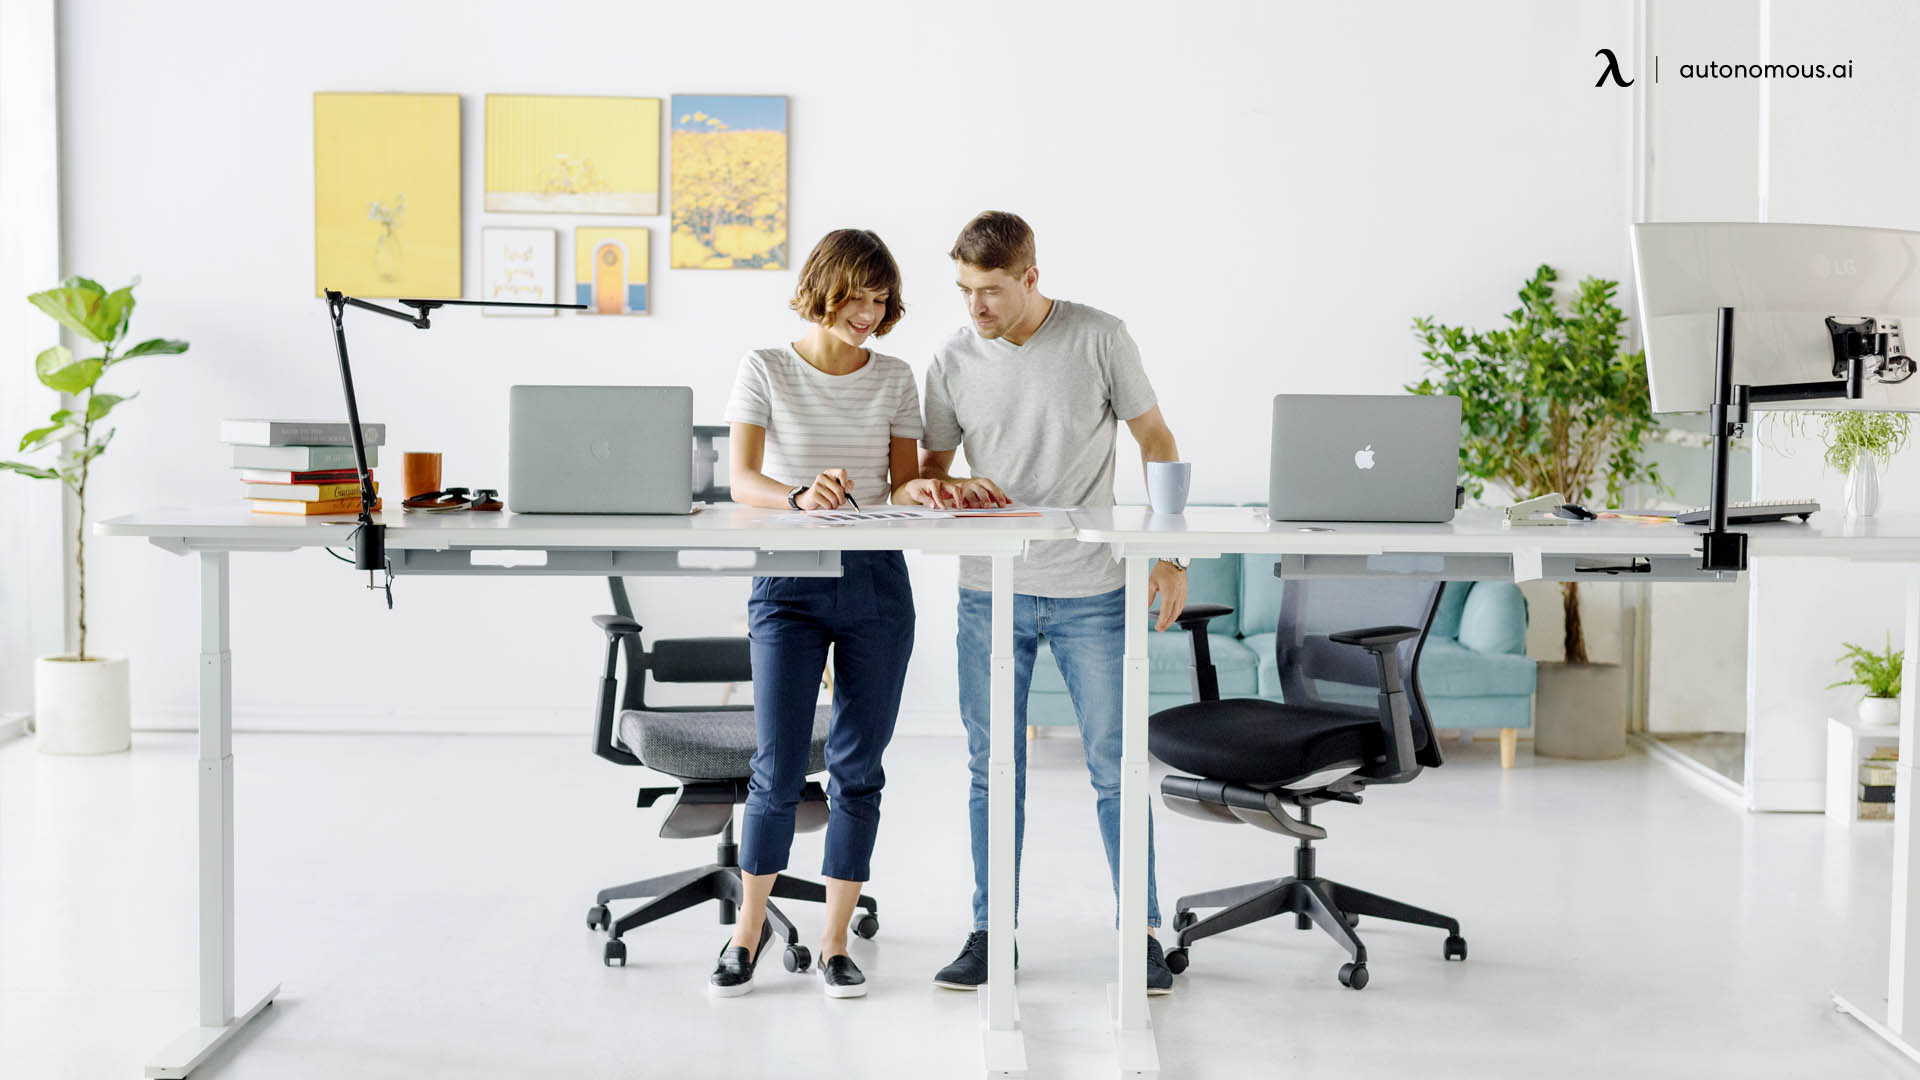 Use ergonomic Practices